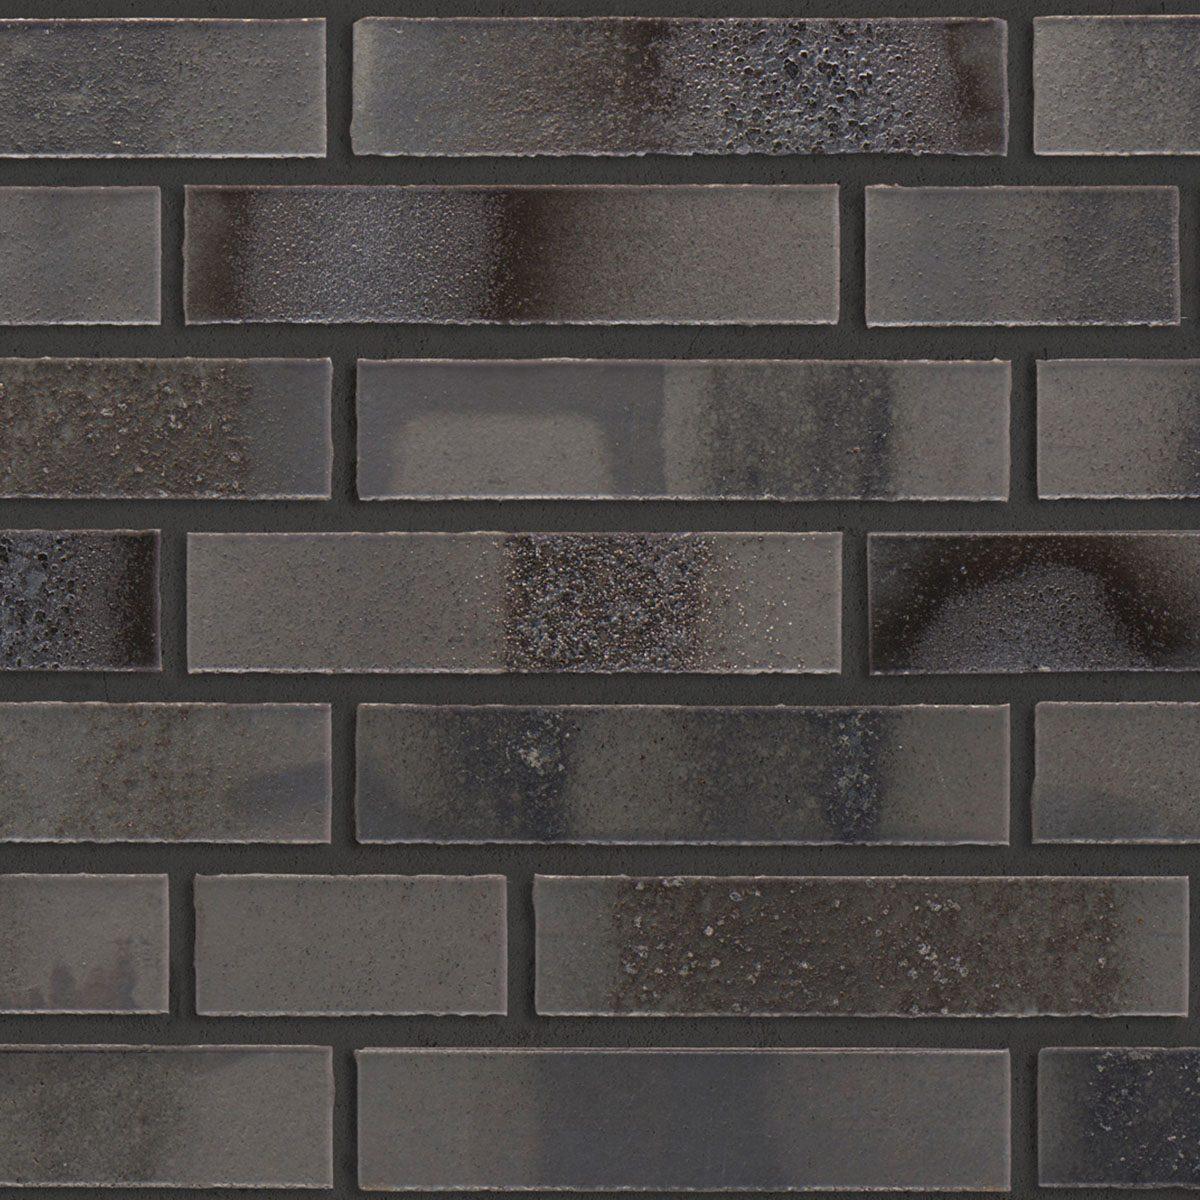 KLAY Tiles Facades - KLAY_KBS-SBR-2109-Ashen-Grey